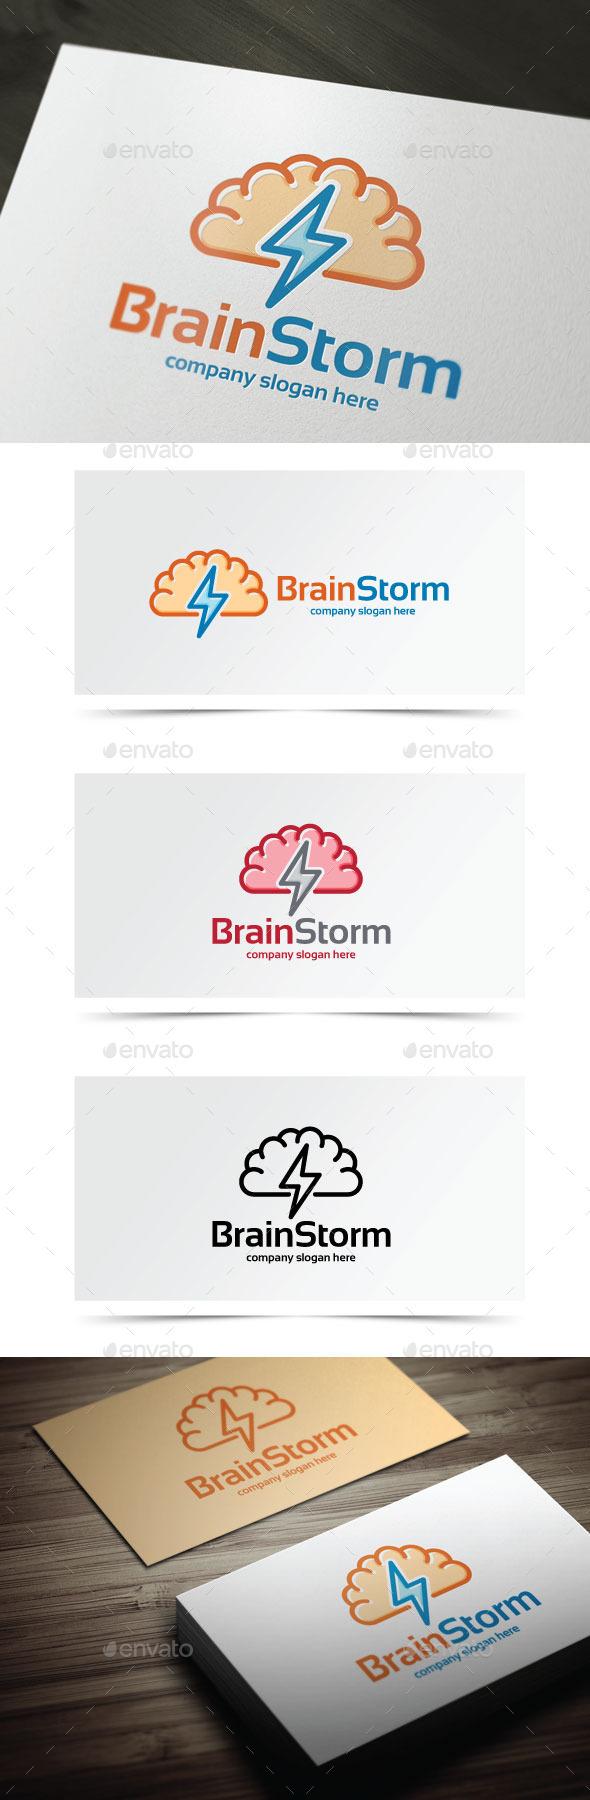 GraphicRiver Brain Storm 8998796